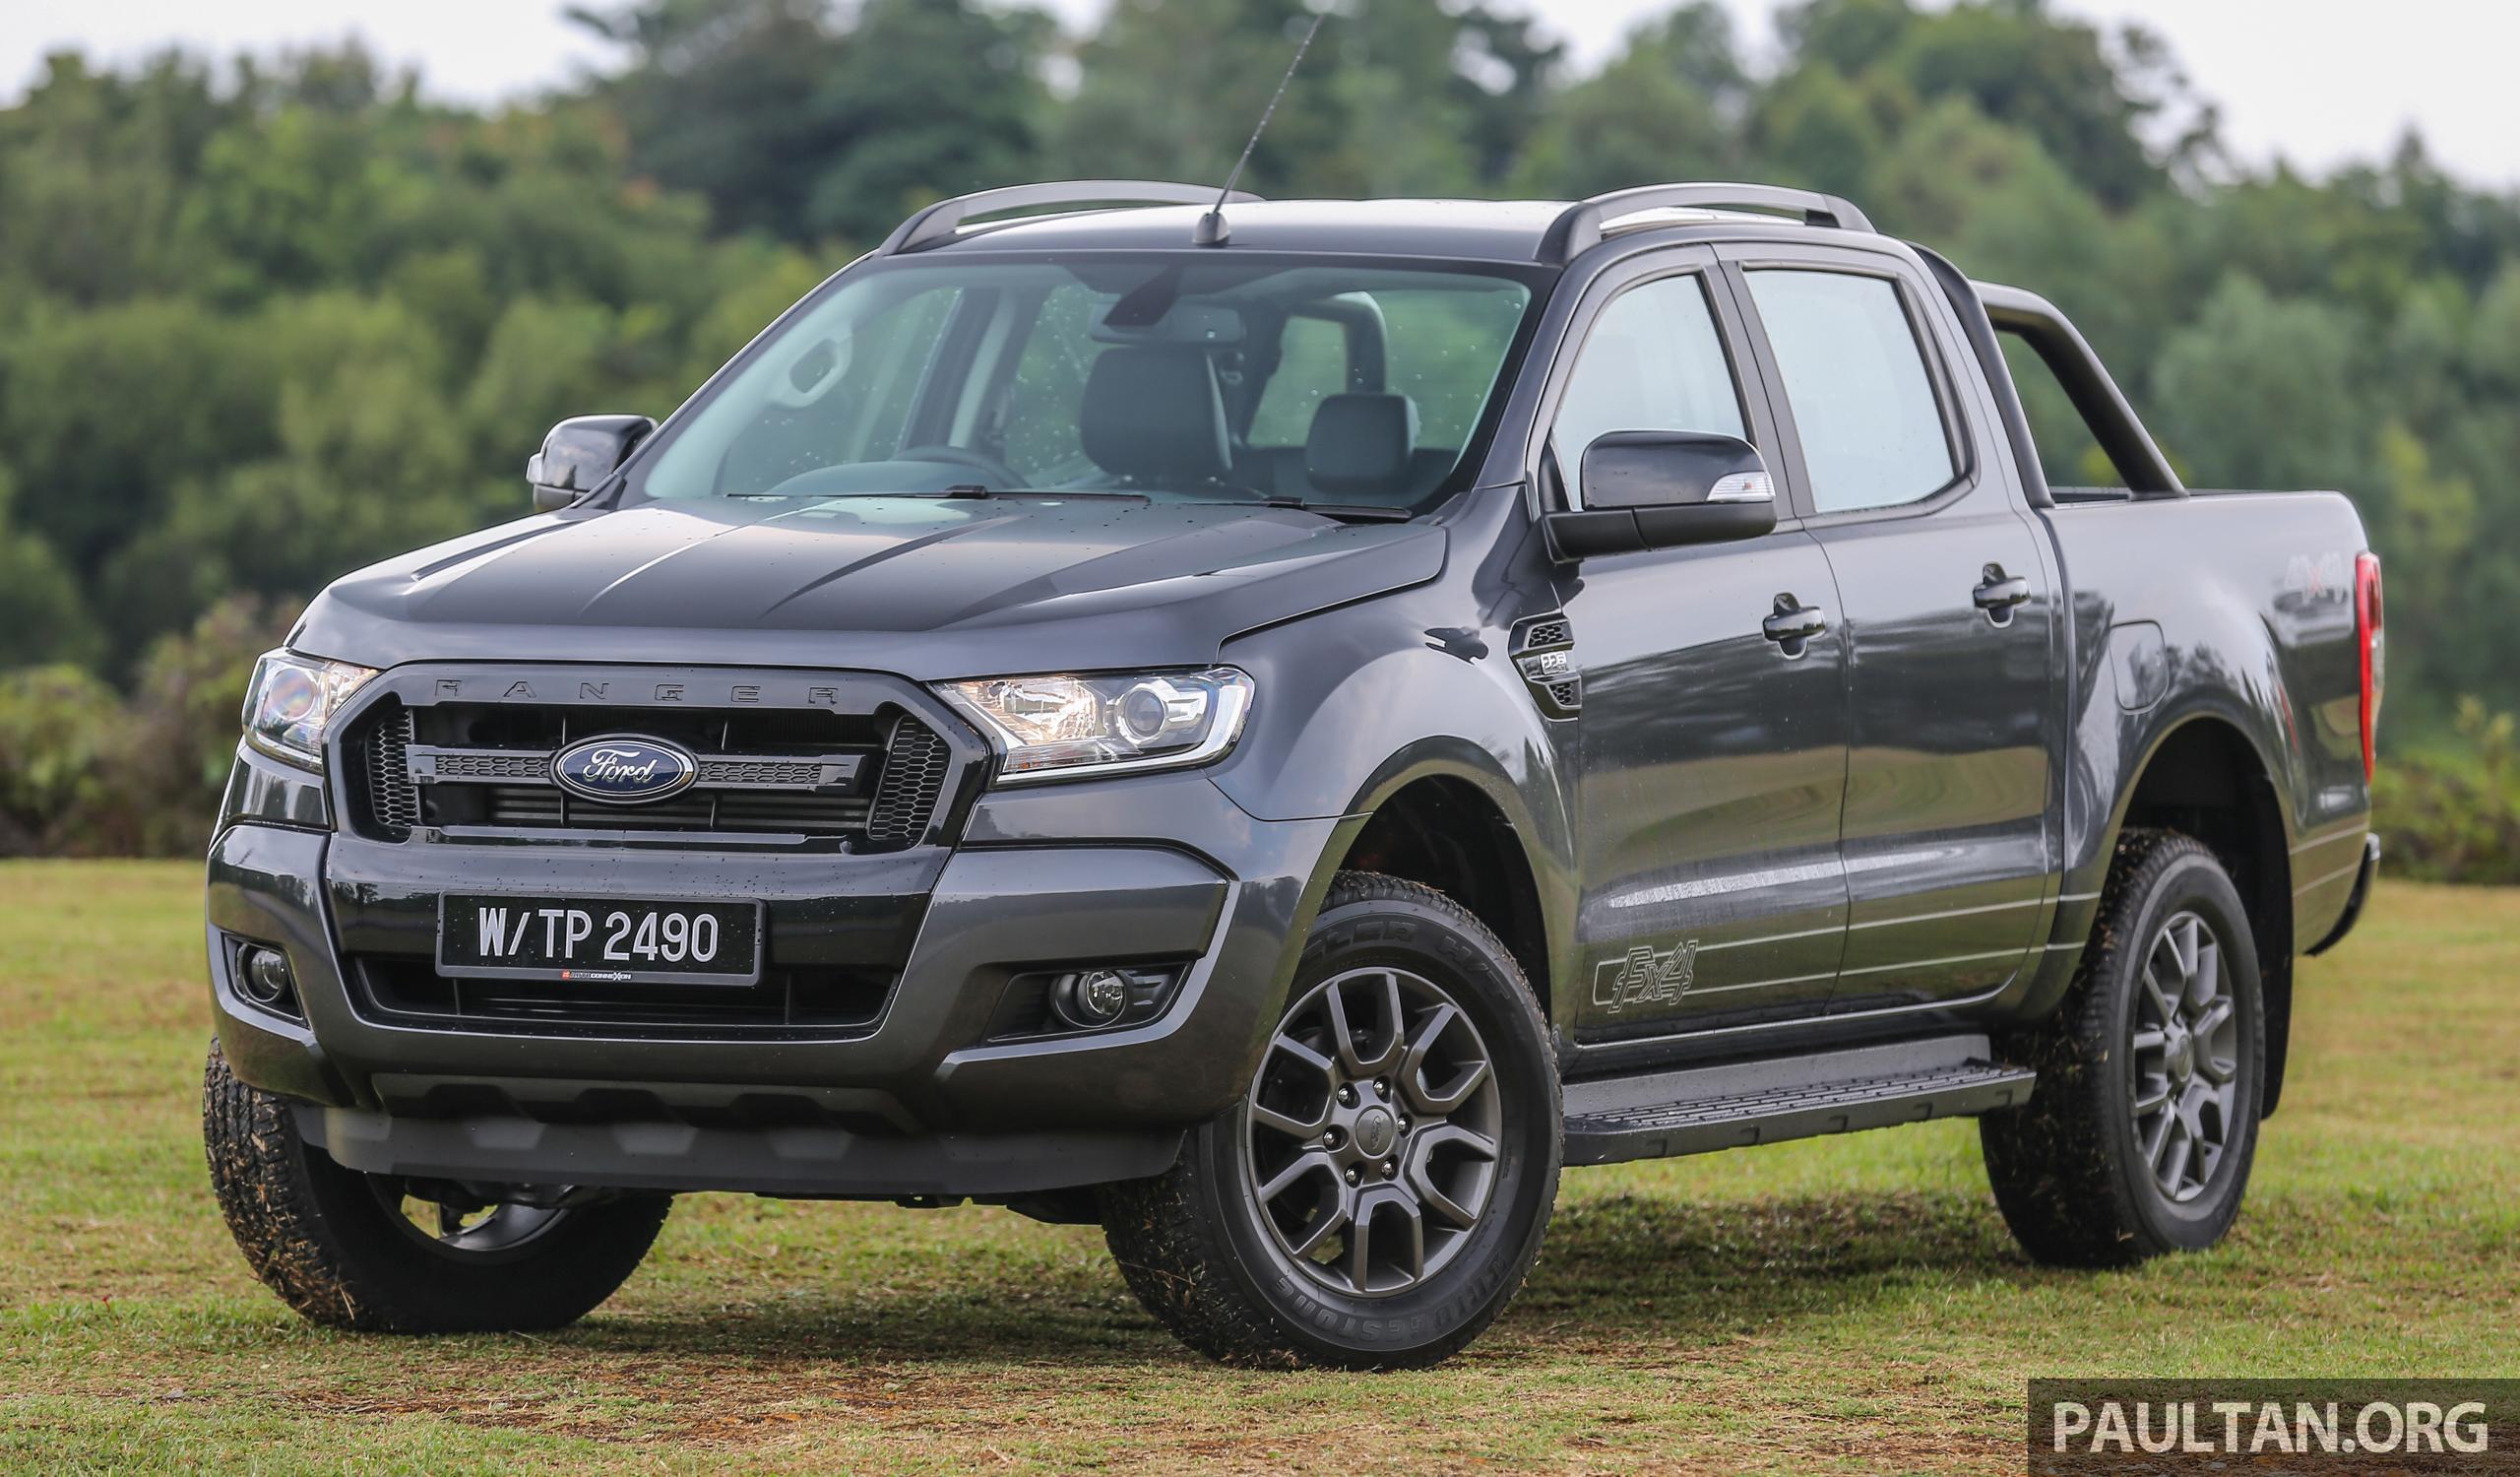 Ford Ranger Coming To Us >> Ford Ranger 2.2L FX4 coming April 20 – RM122k est Image 642113